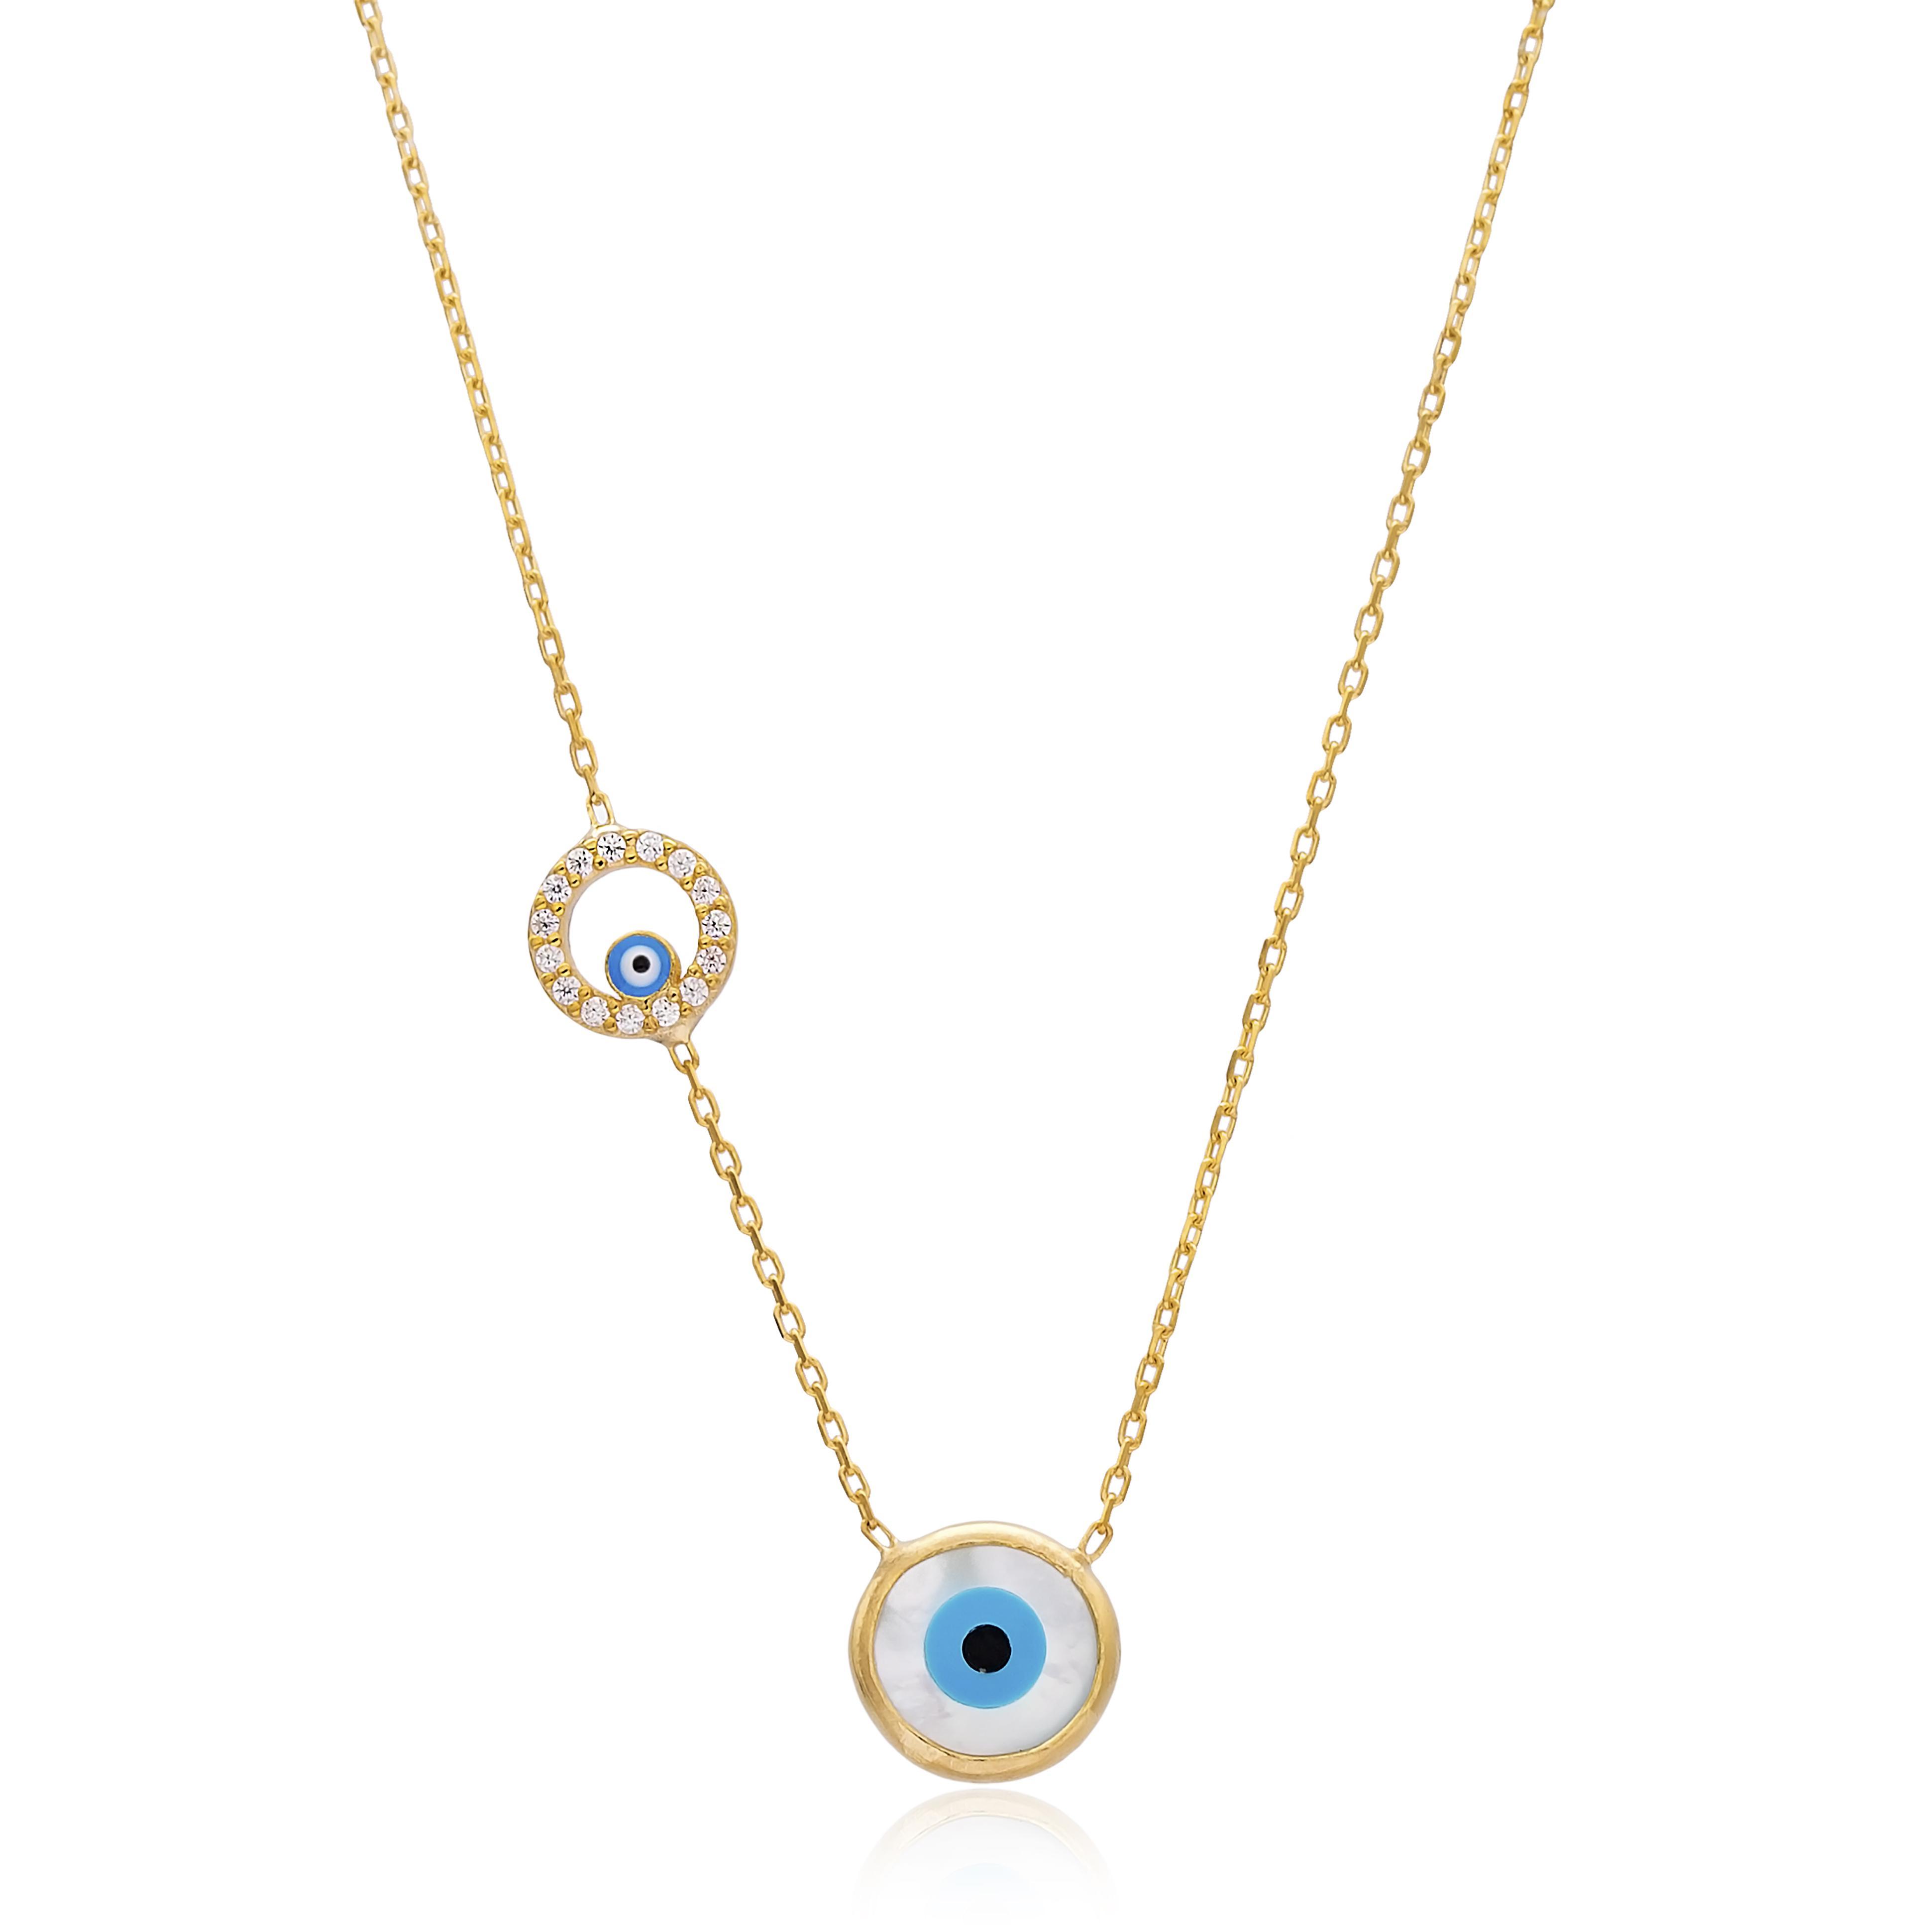 Hematite Stone Charm Necklace Wholesale Handmade Turkish Jewelry Necklace